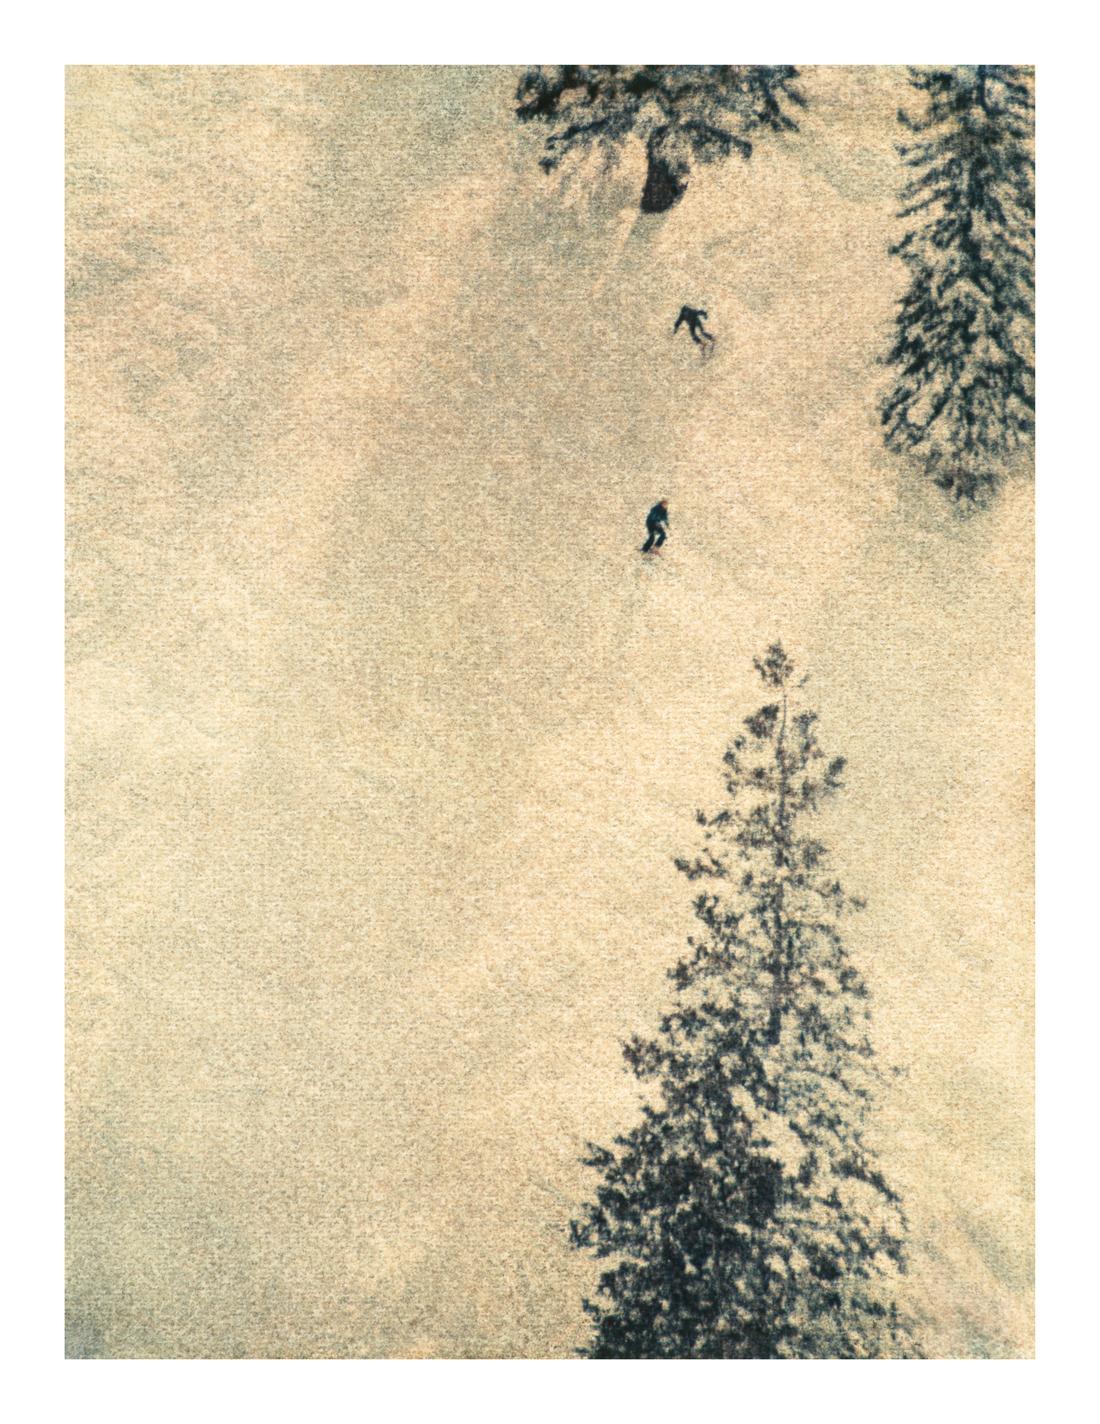 Aspen #9, 2007 (1996)